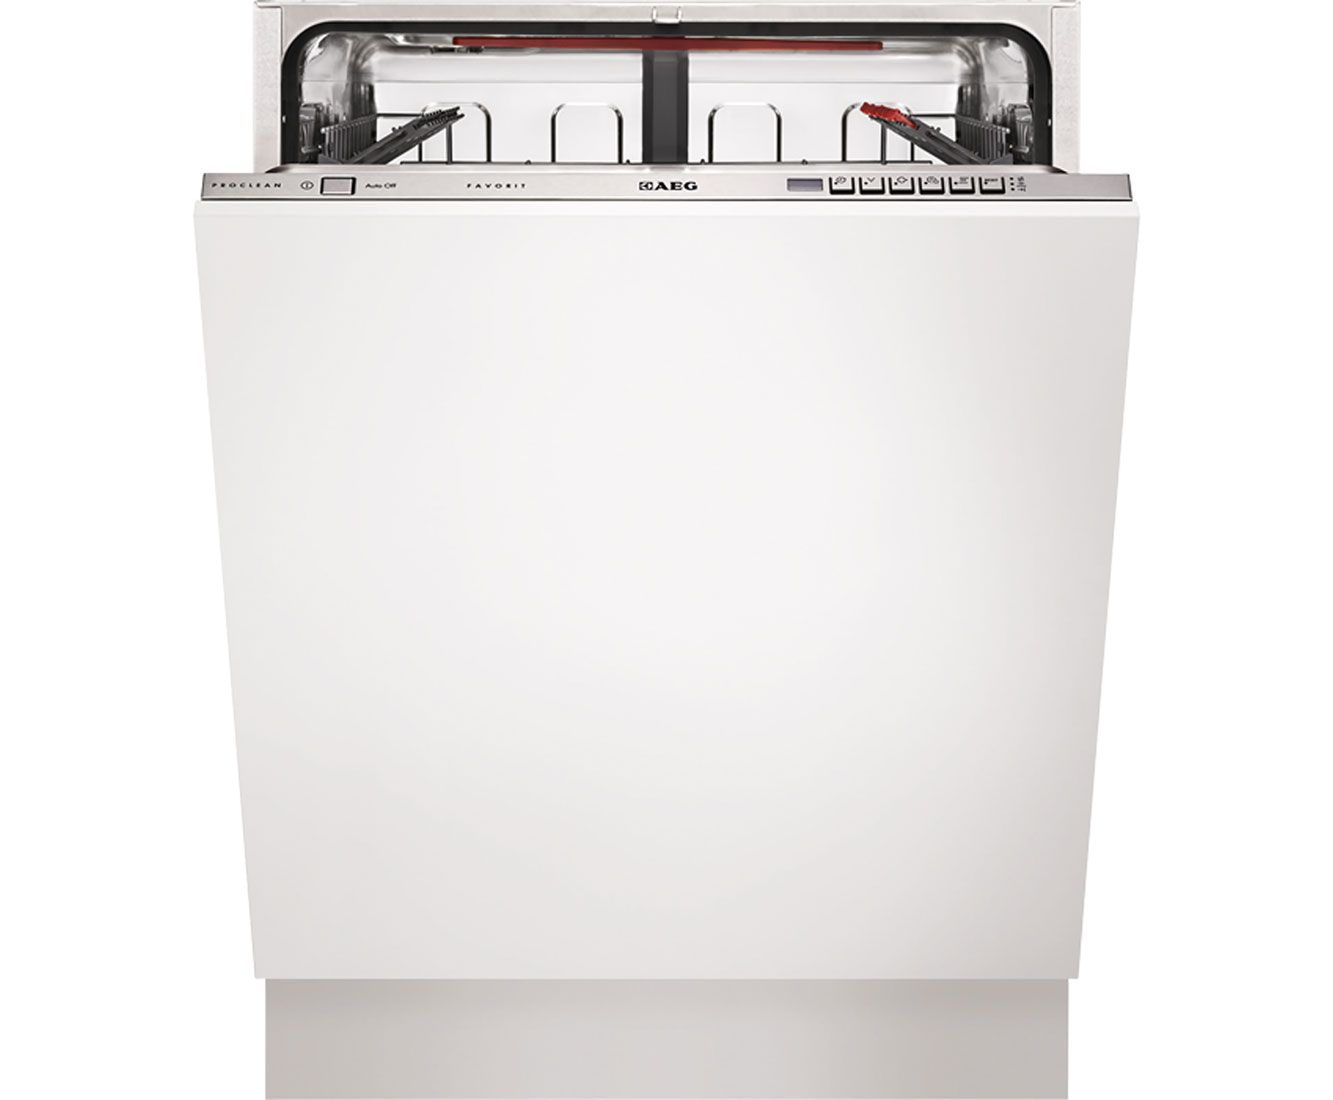 Aeg Kühlschrank Idealo : Aeg favorit f vi p vollintegrierter geschirrspüler cm a